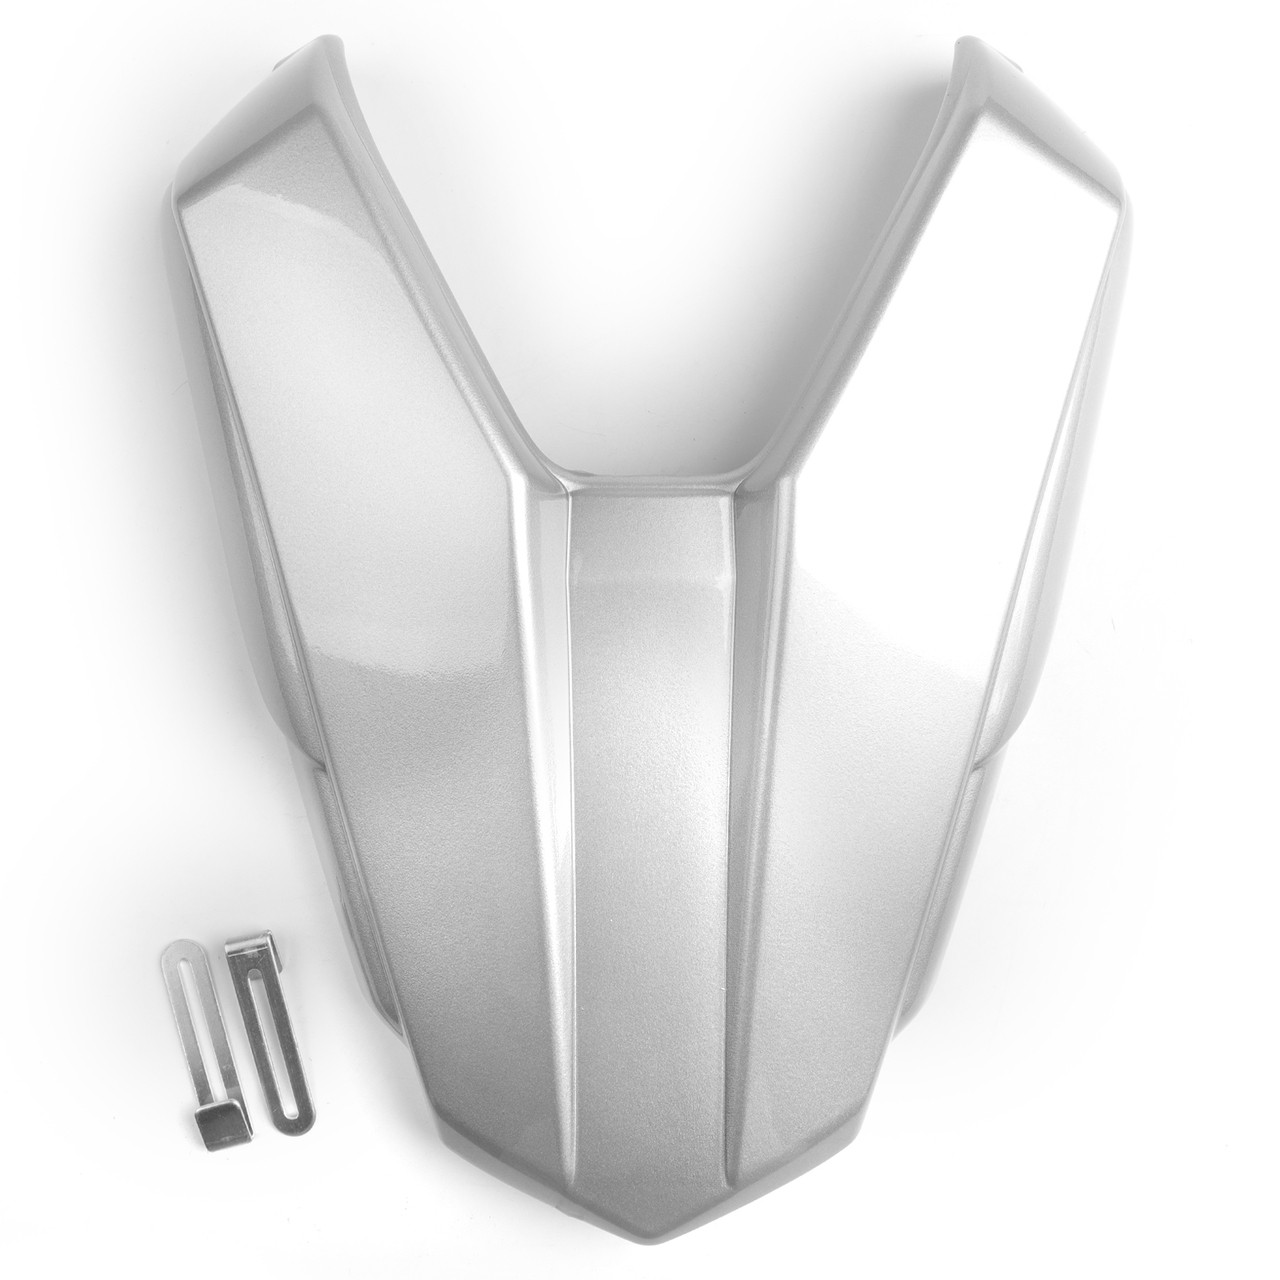 Rear Seat Cover Cowl Fairing Body Tail For Honda CB500F CBR500R 2016-2018 Silver